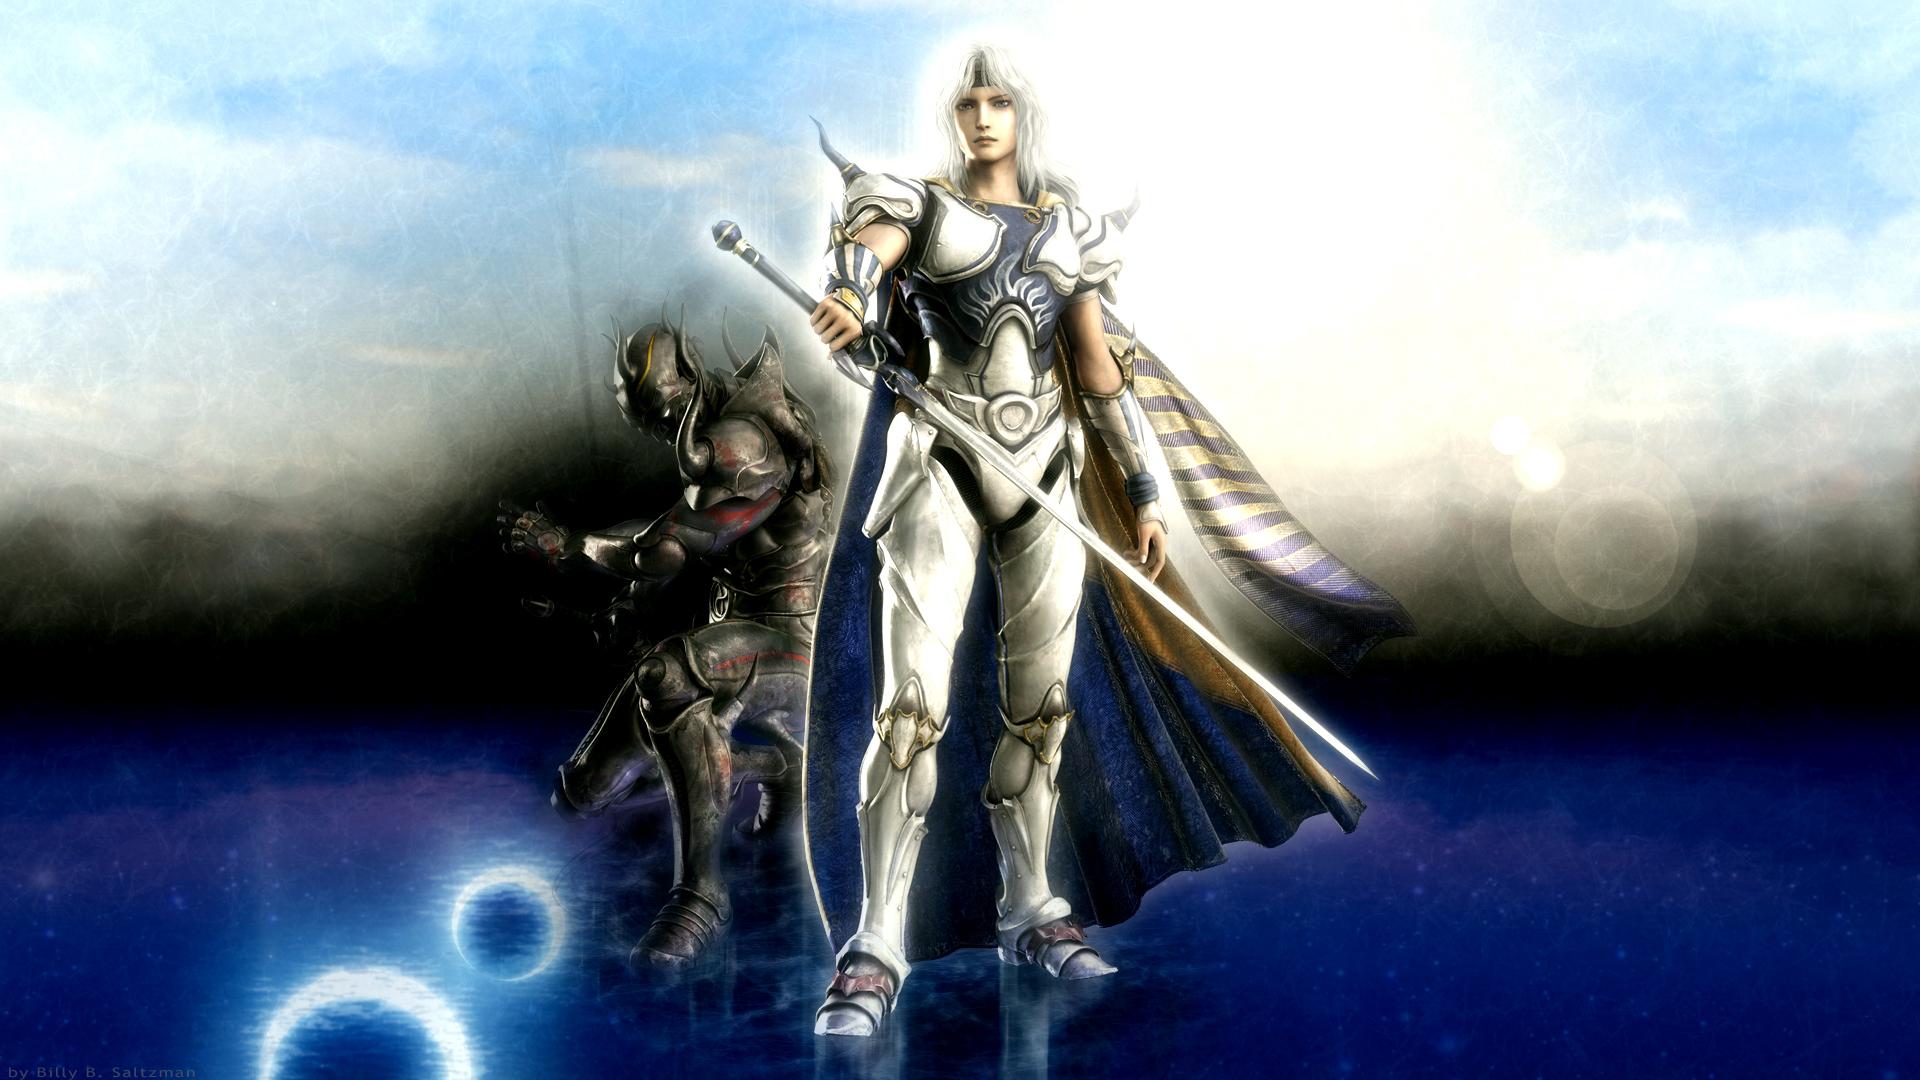 Final Fantasy IV Wallpaper 3 by Billysan291 on DeviantArt